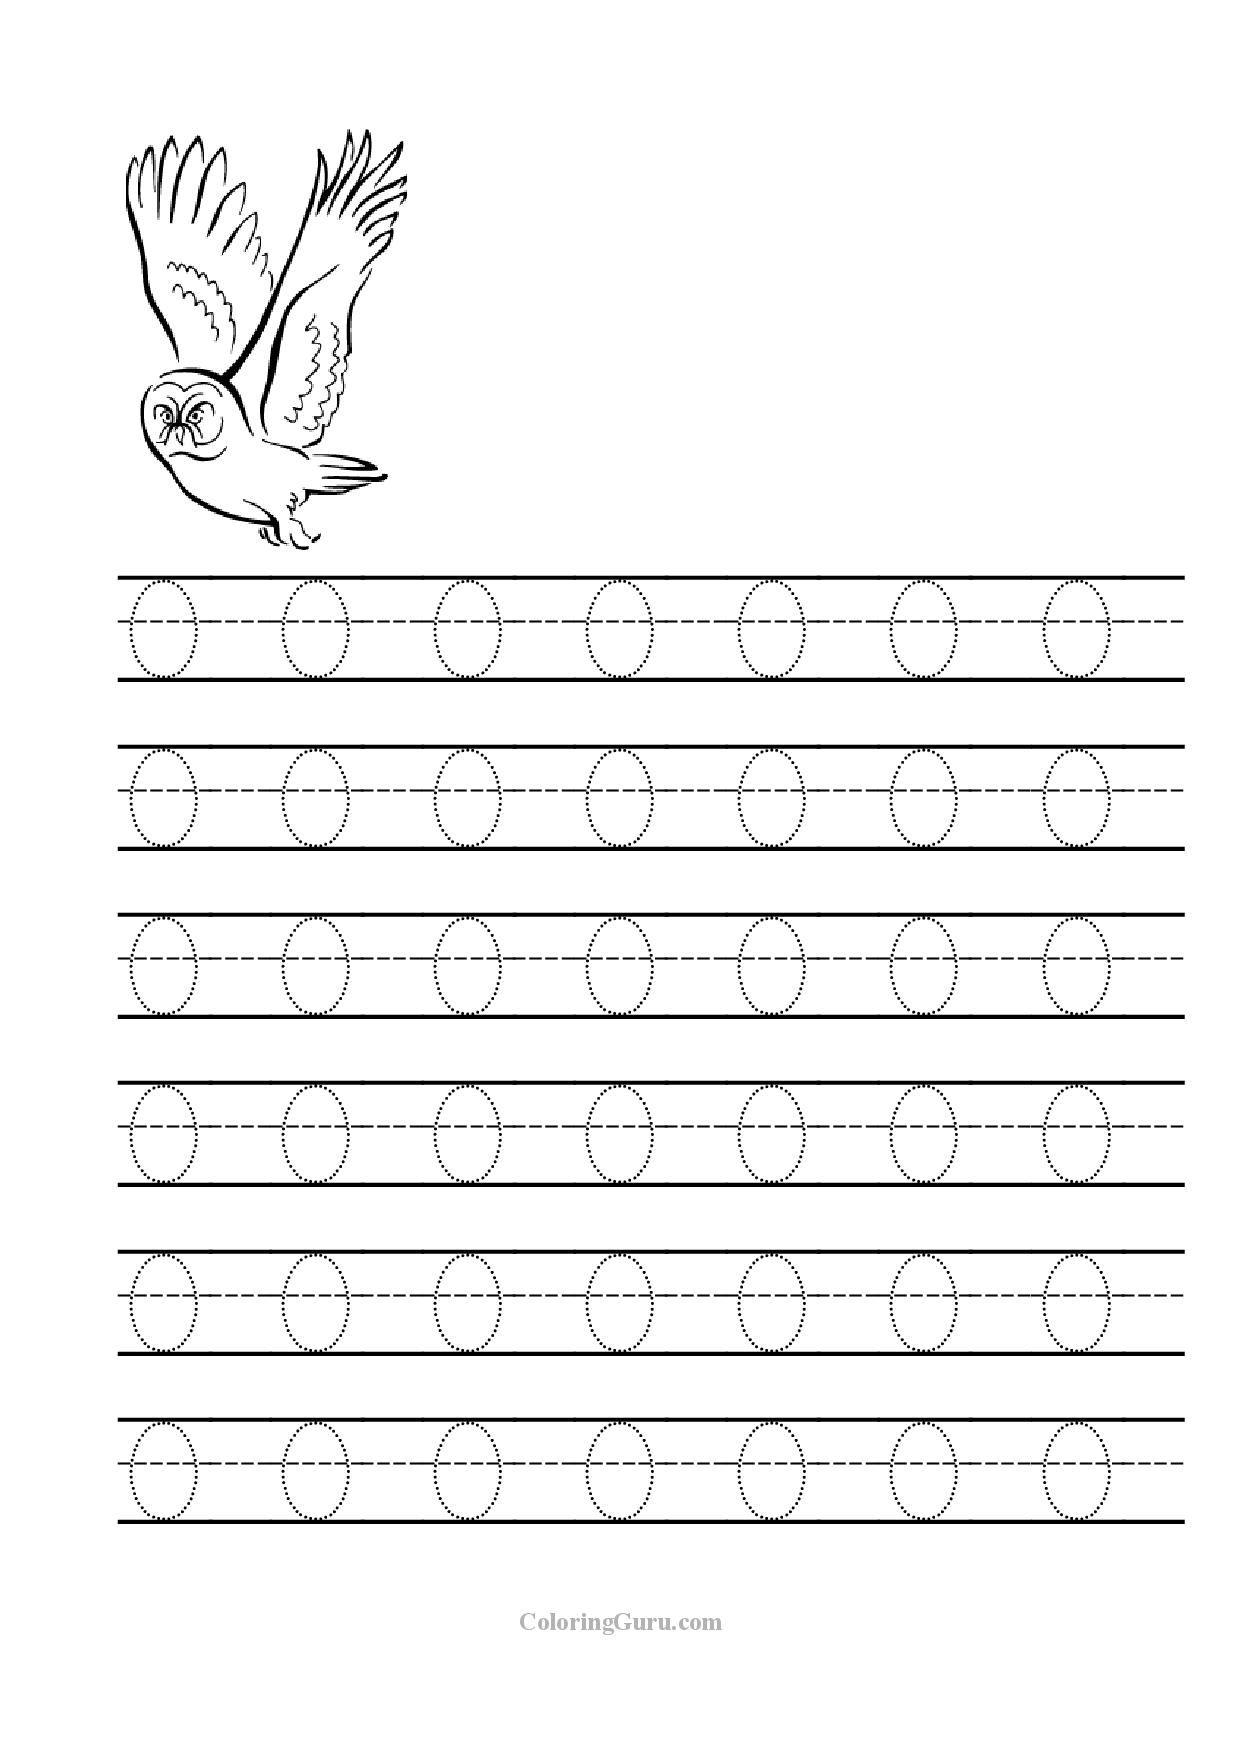 Tracing_Letter_O_Worksheets_For_Preschool 1,240×1,754